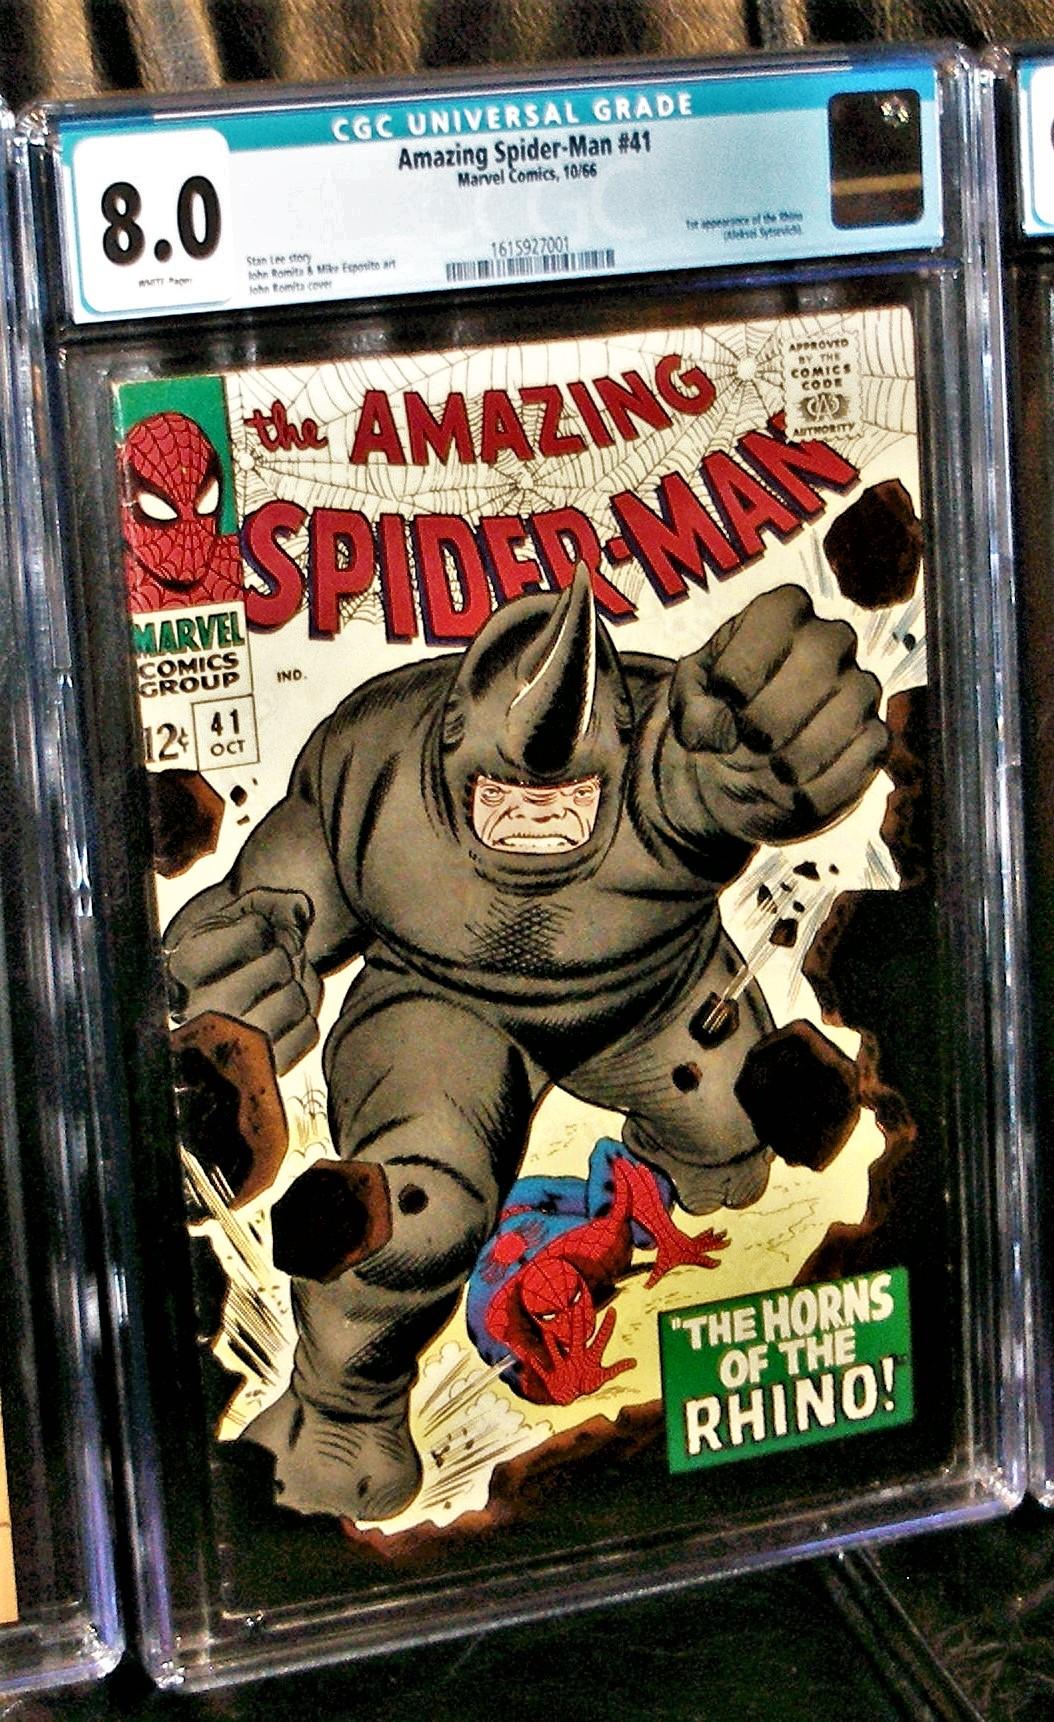 AMZING SPIDER-MAN 41